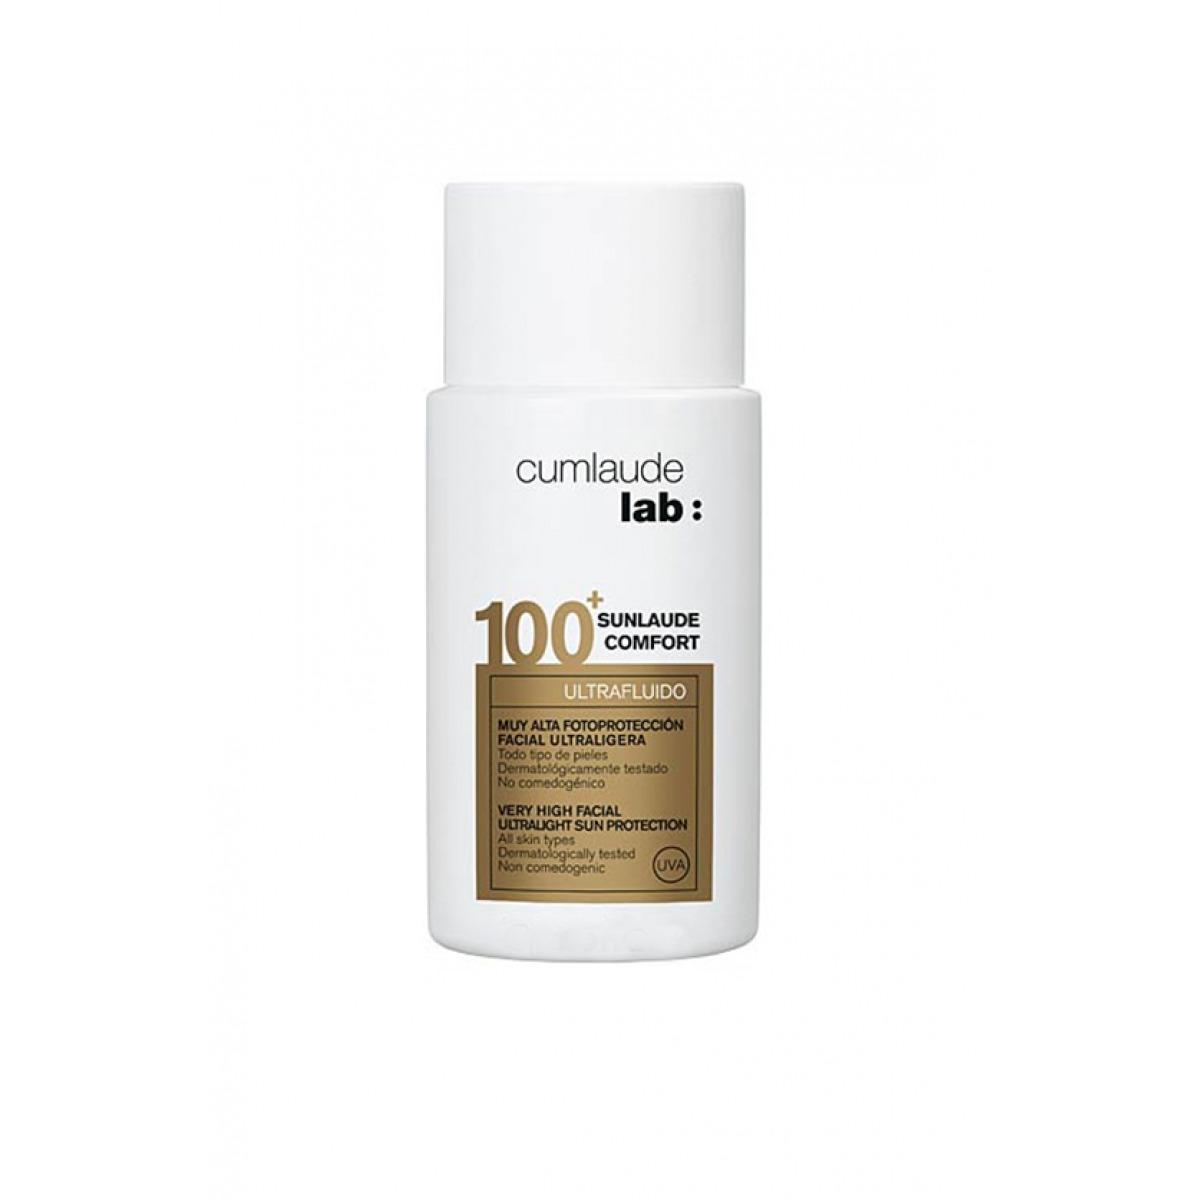 SUNLAUDE COMFORT IP 100 75 ML.